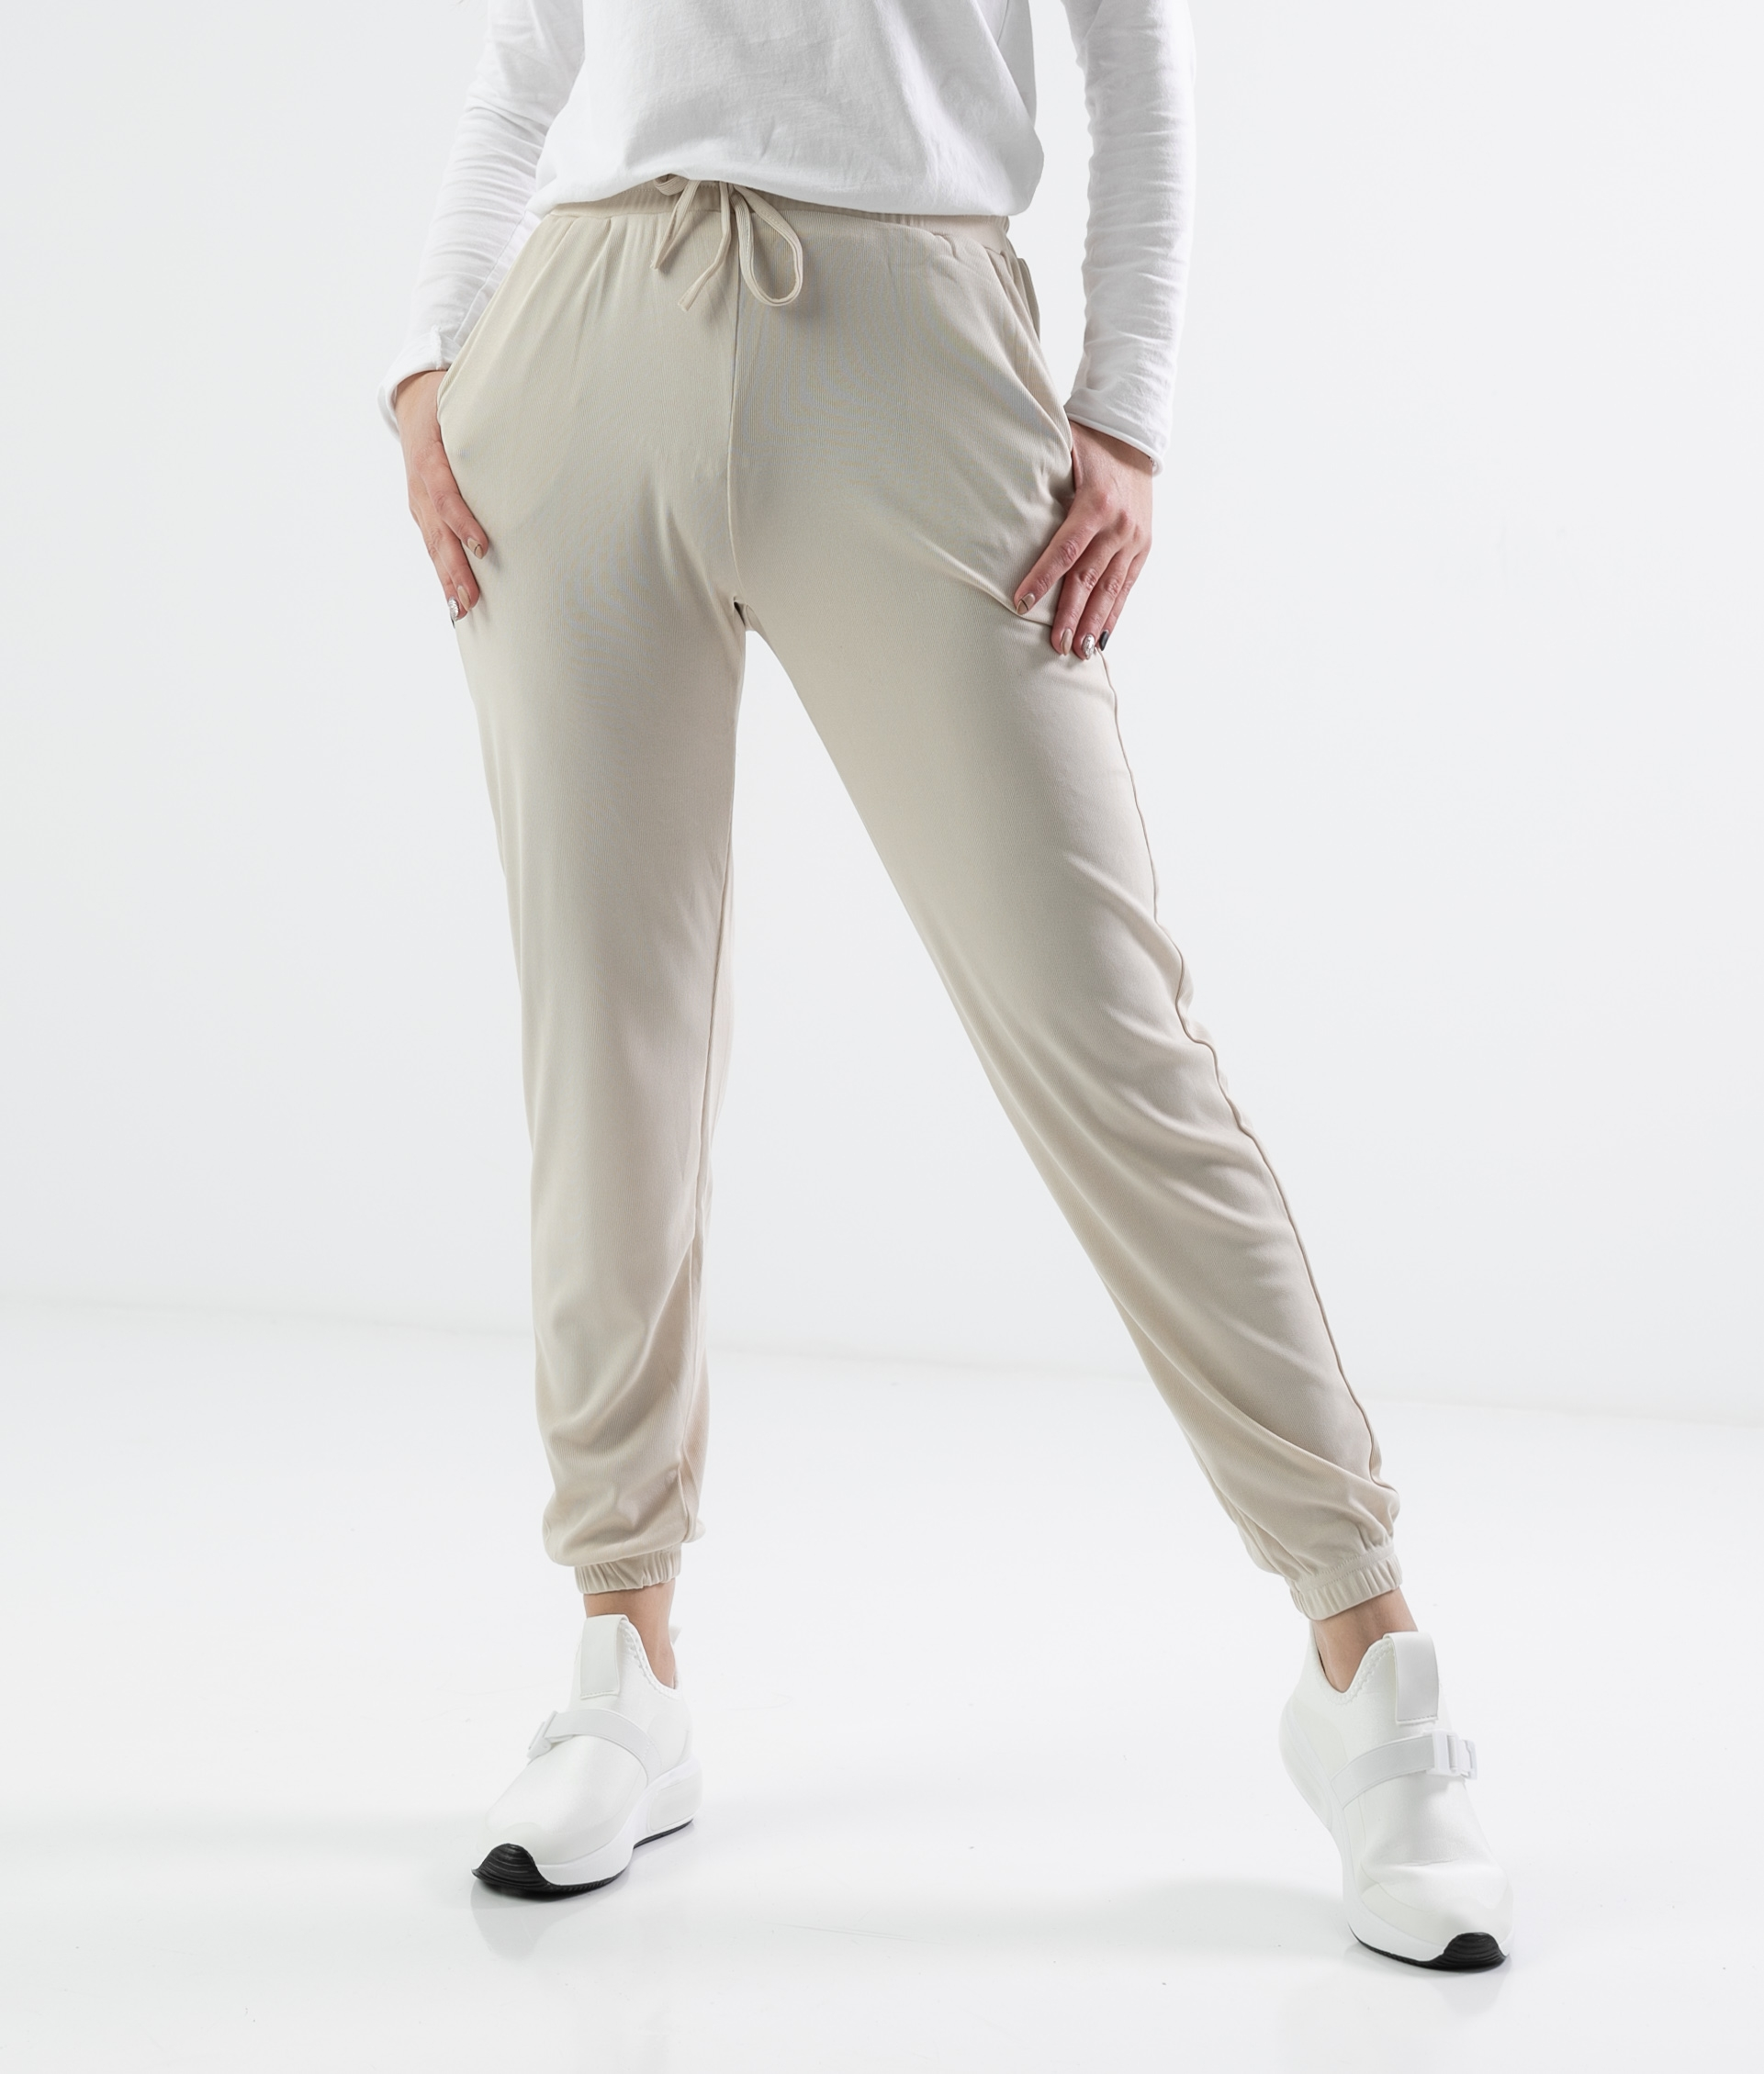 Pantalón Emere - Beige